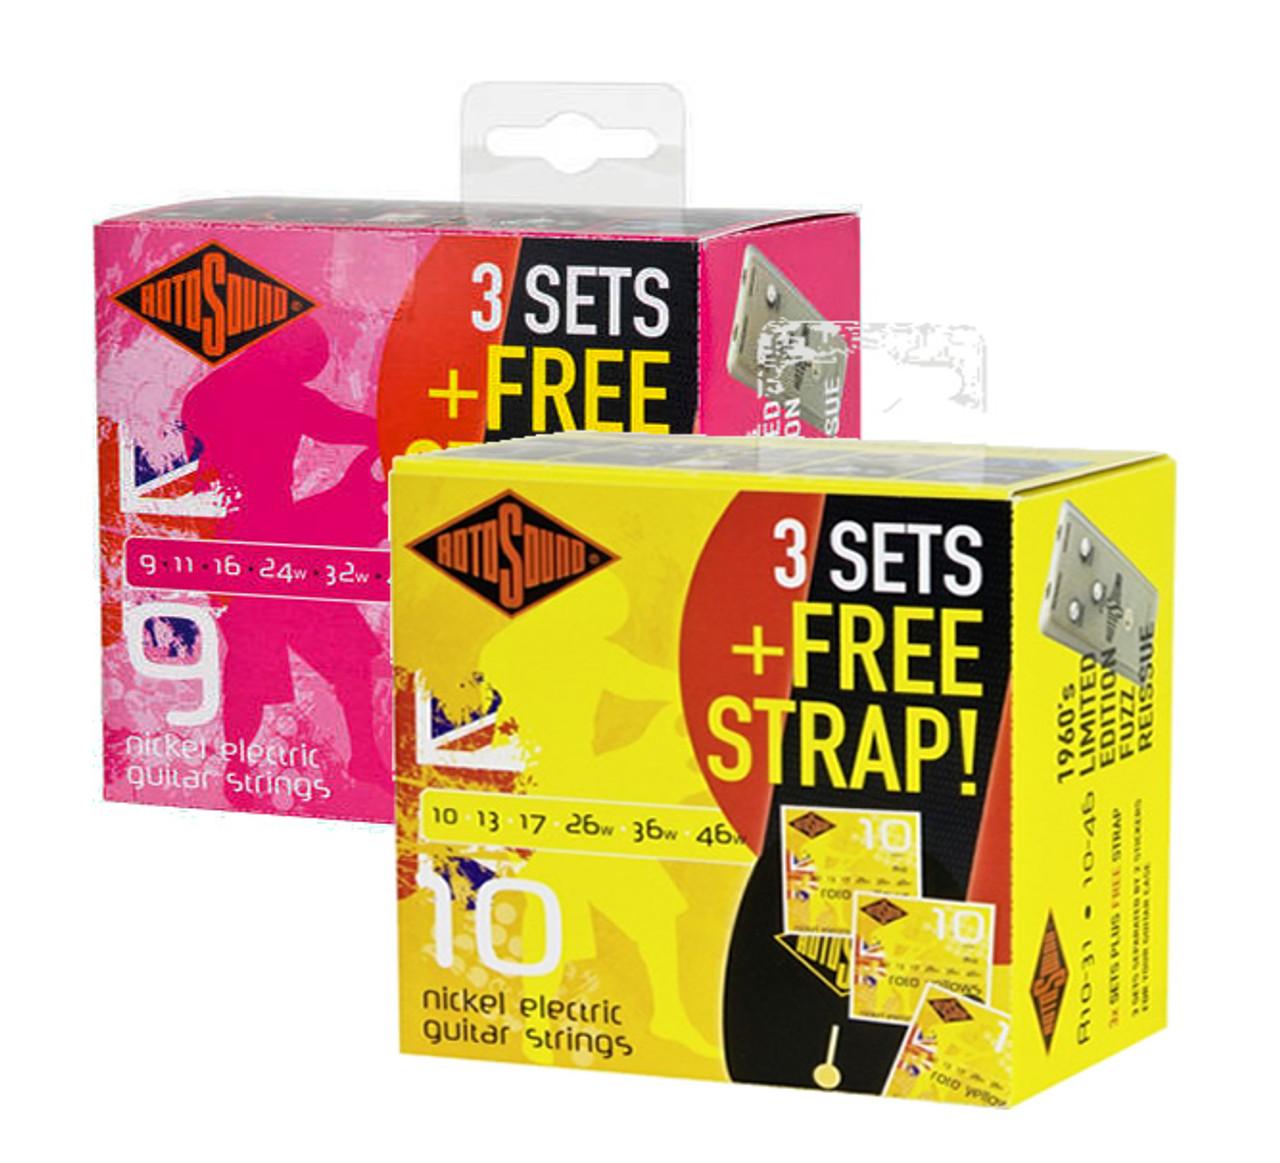 Rotosound Electrics 3 Pack Free Strap